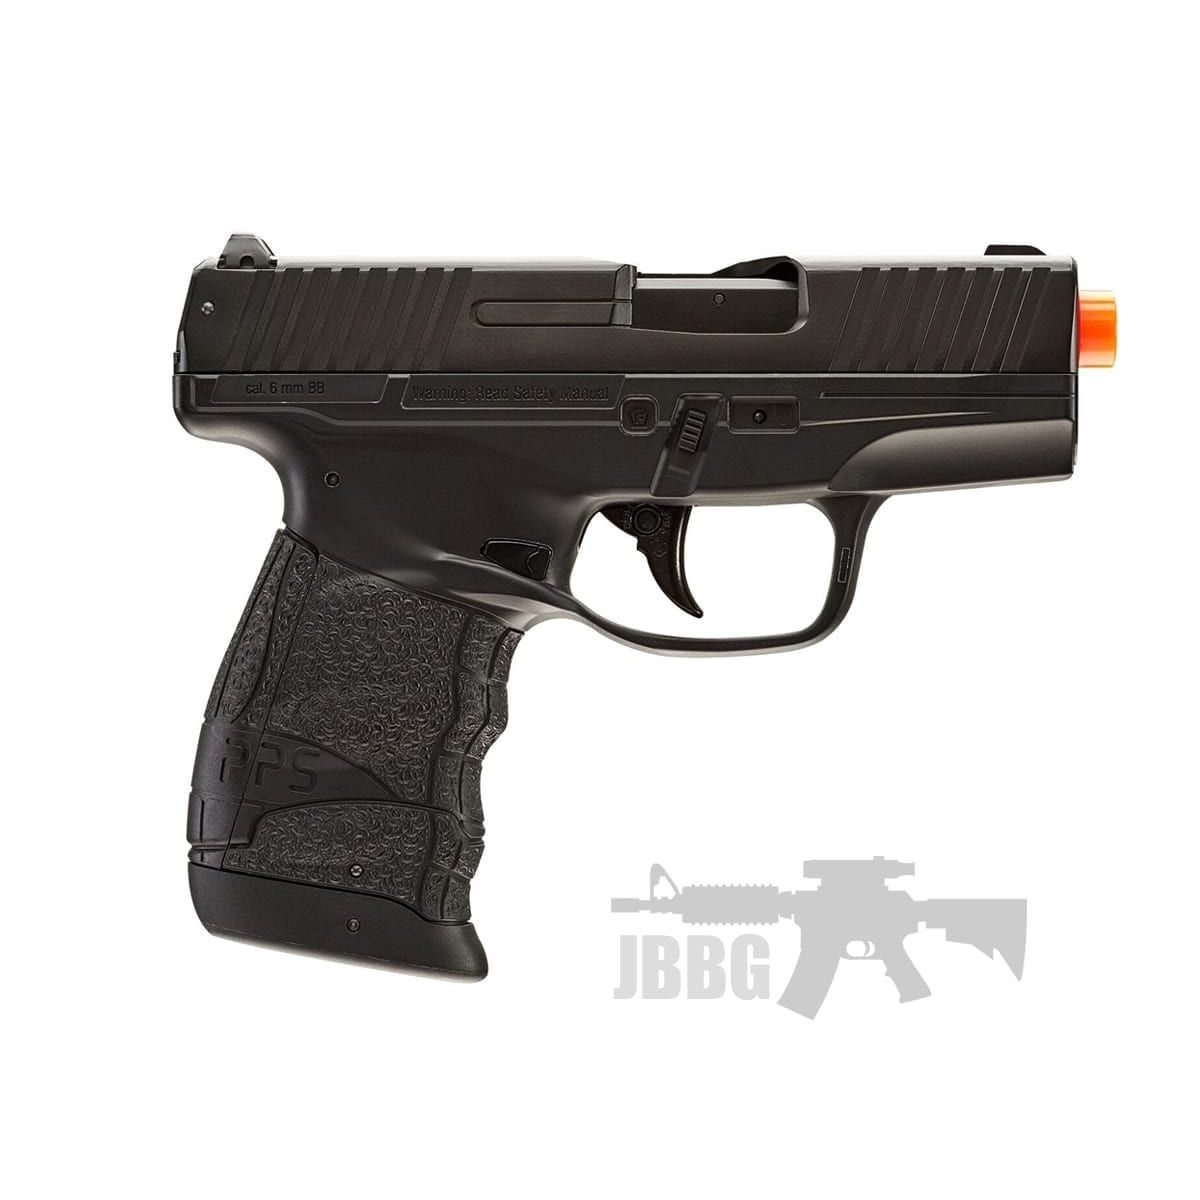 sdd m2 pistol